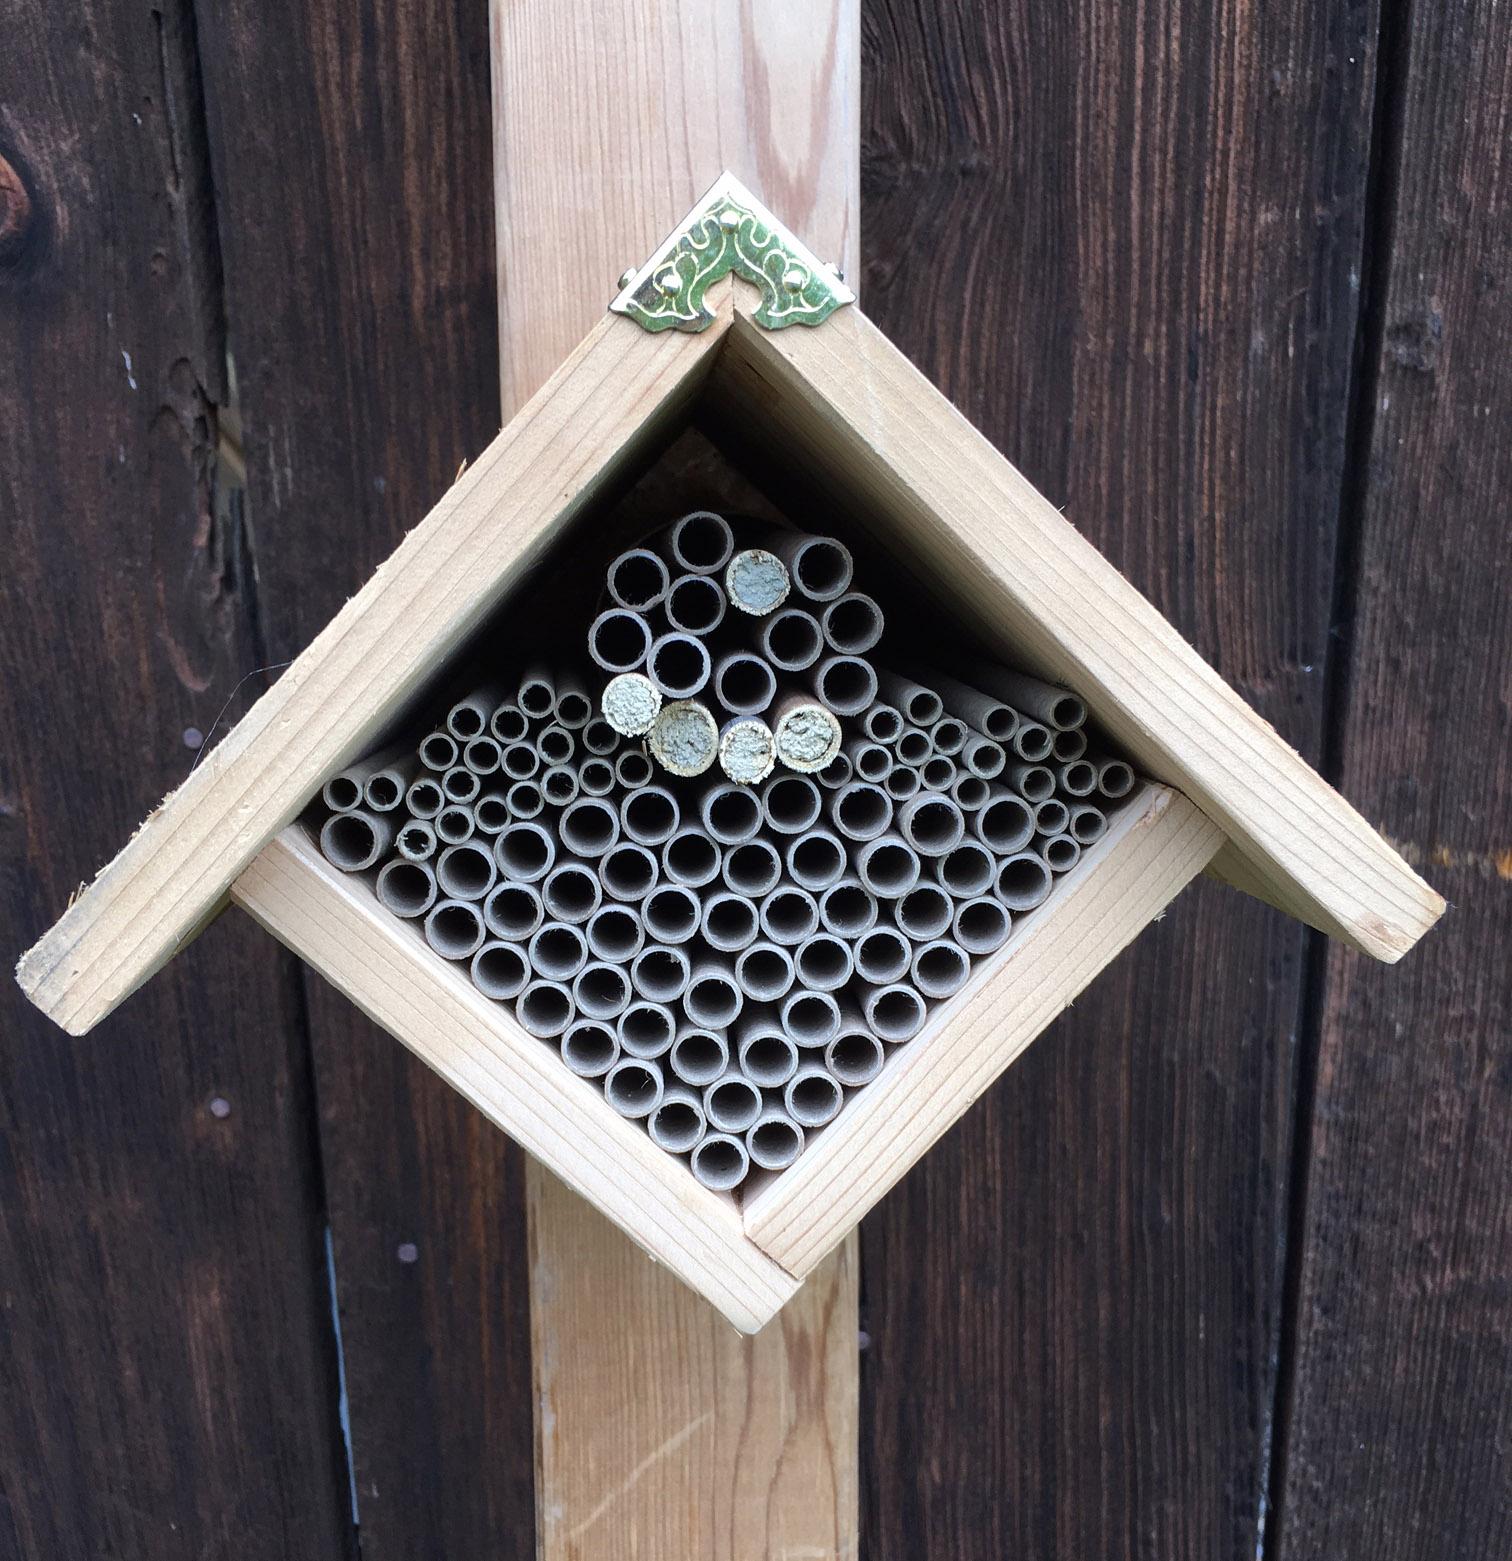 Mason bee house and tubes.jpg